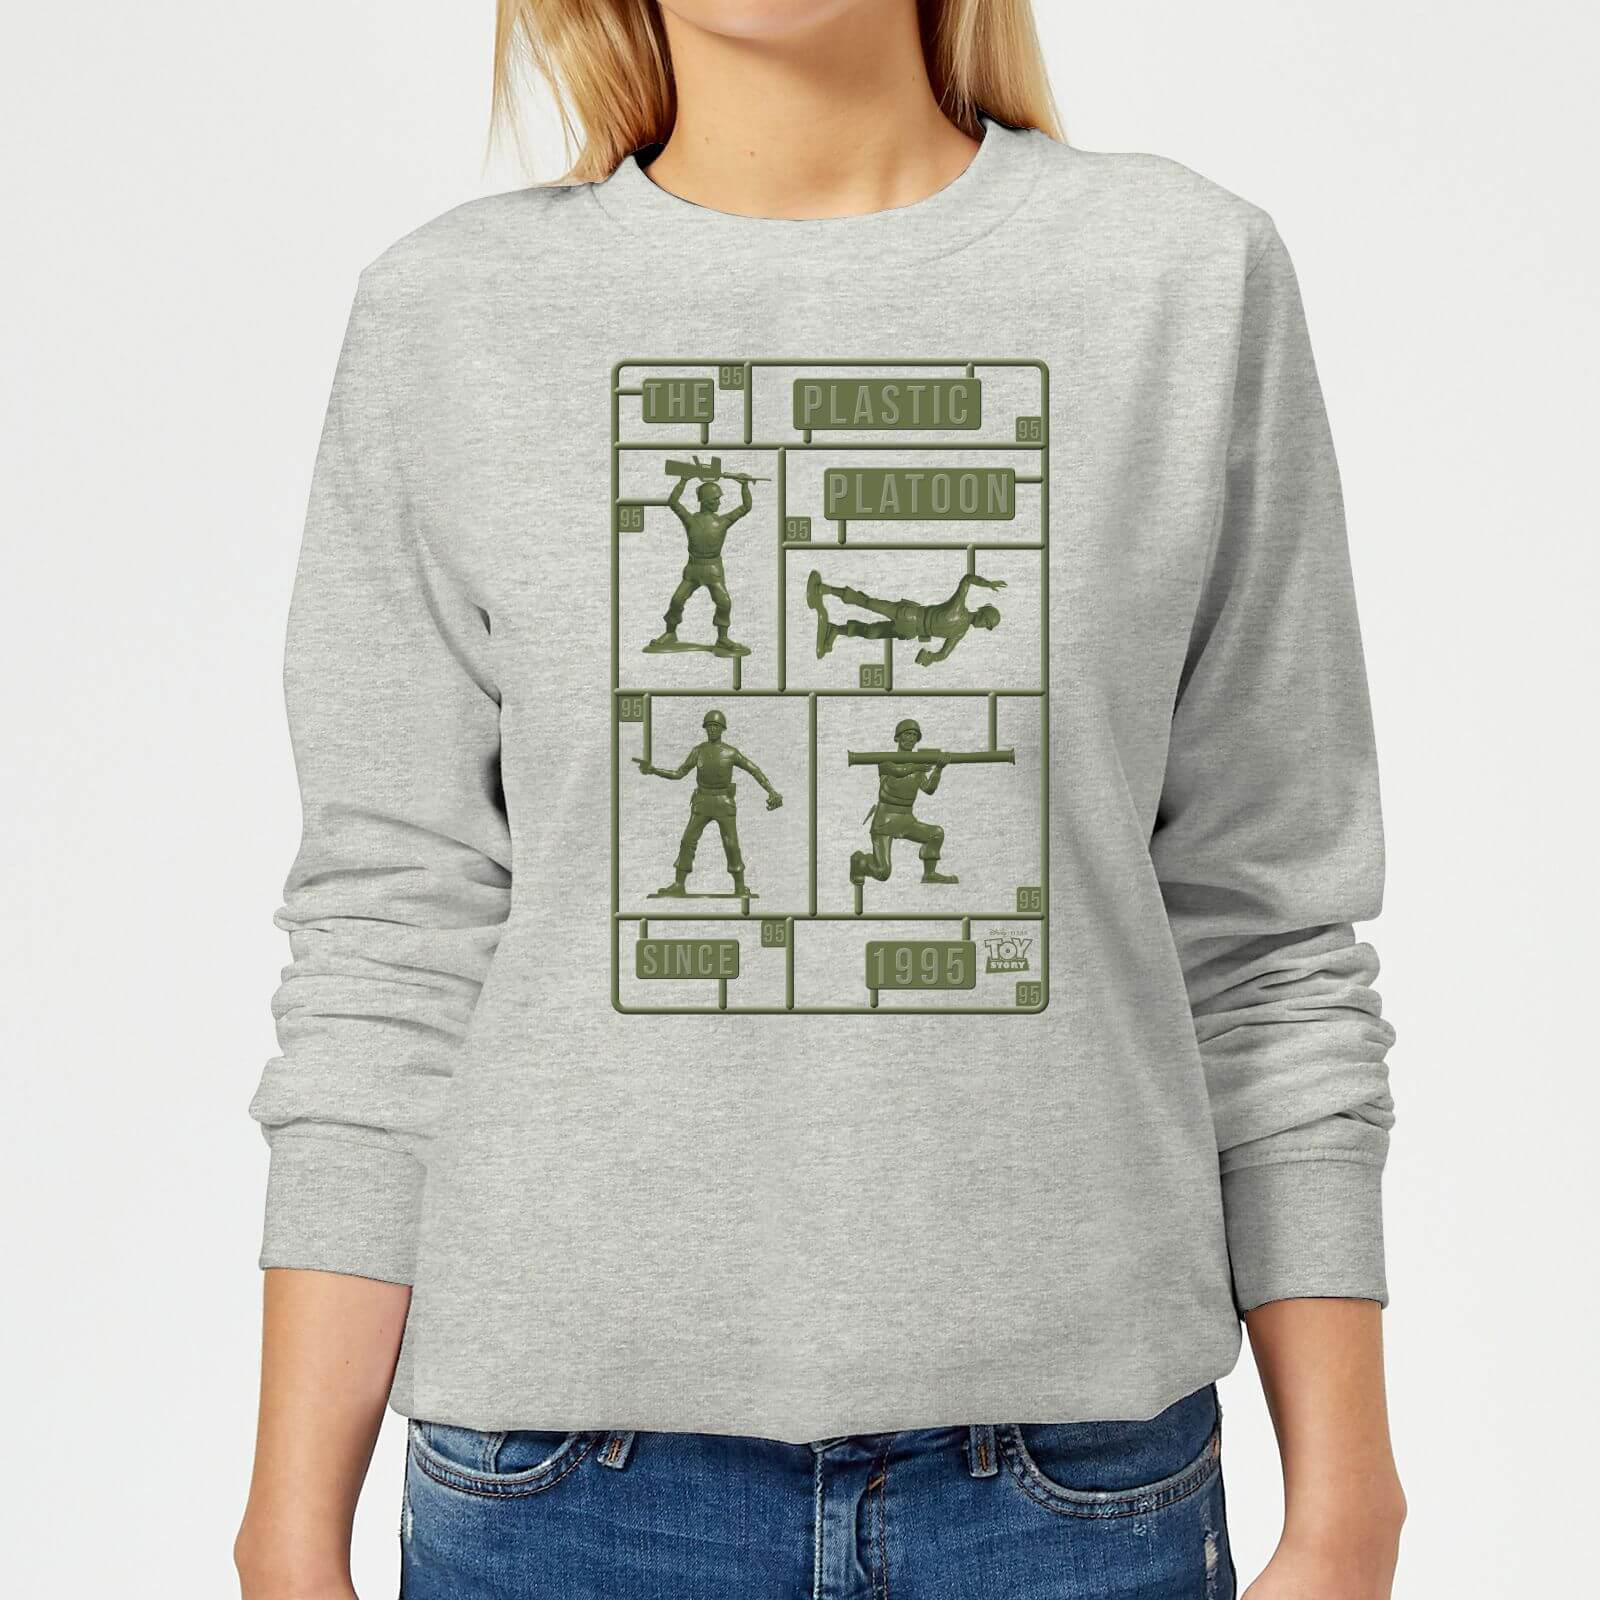 1c1589eb0cd Disney Toy Story Plastic Platoon Sweatshirt in Gray - Lyst